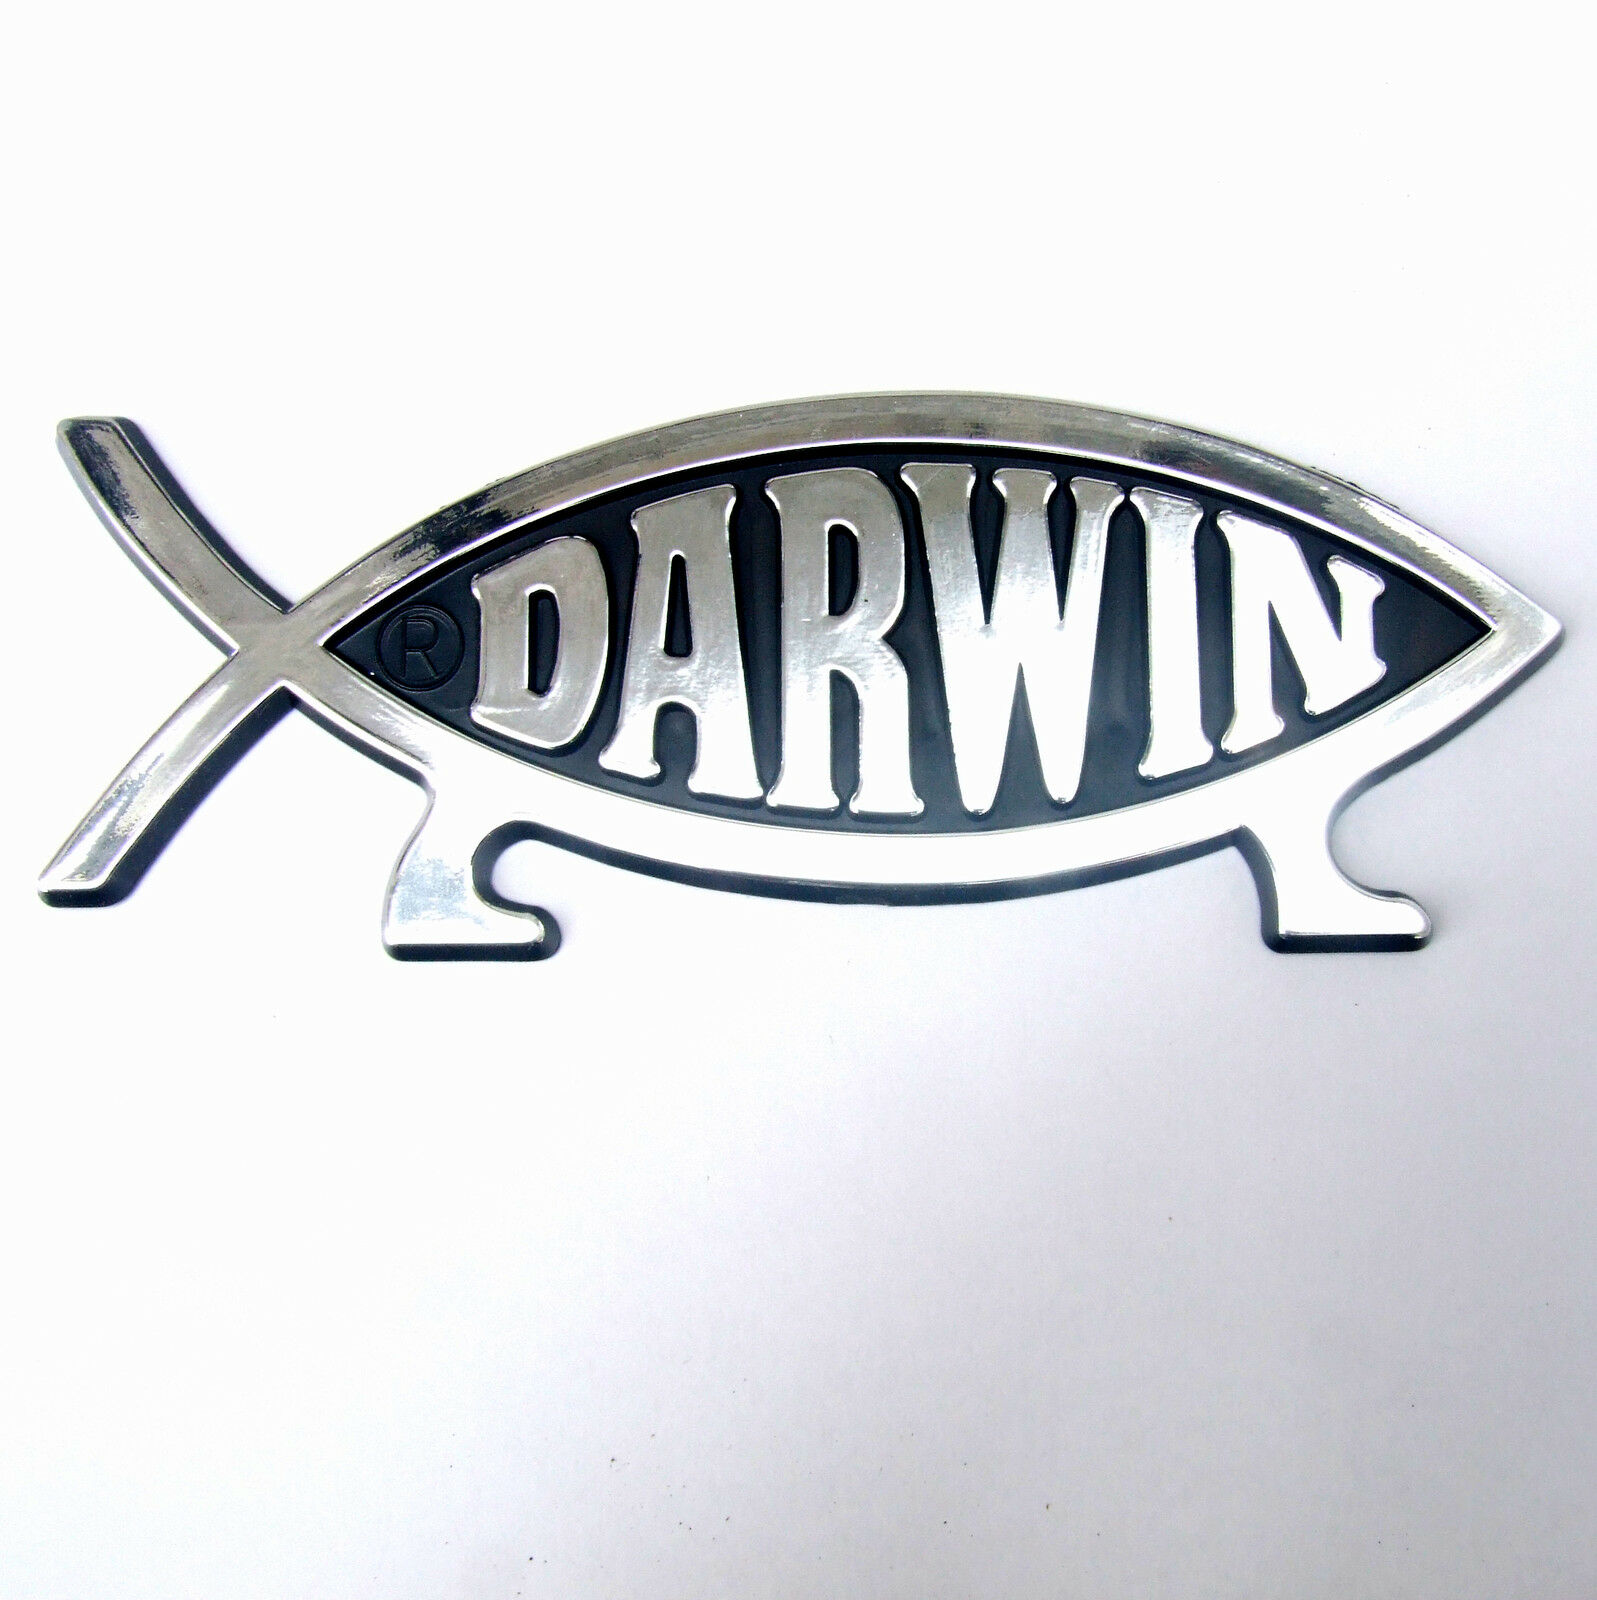 Darwin fish on legs car emblem badge symbol plaque 4 for Fish symbol on cars